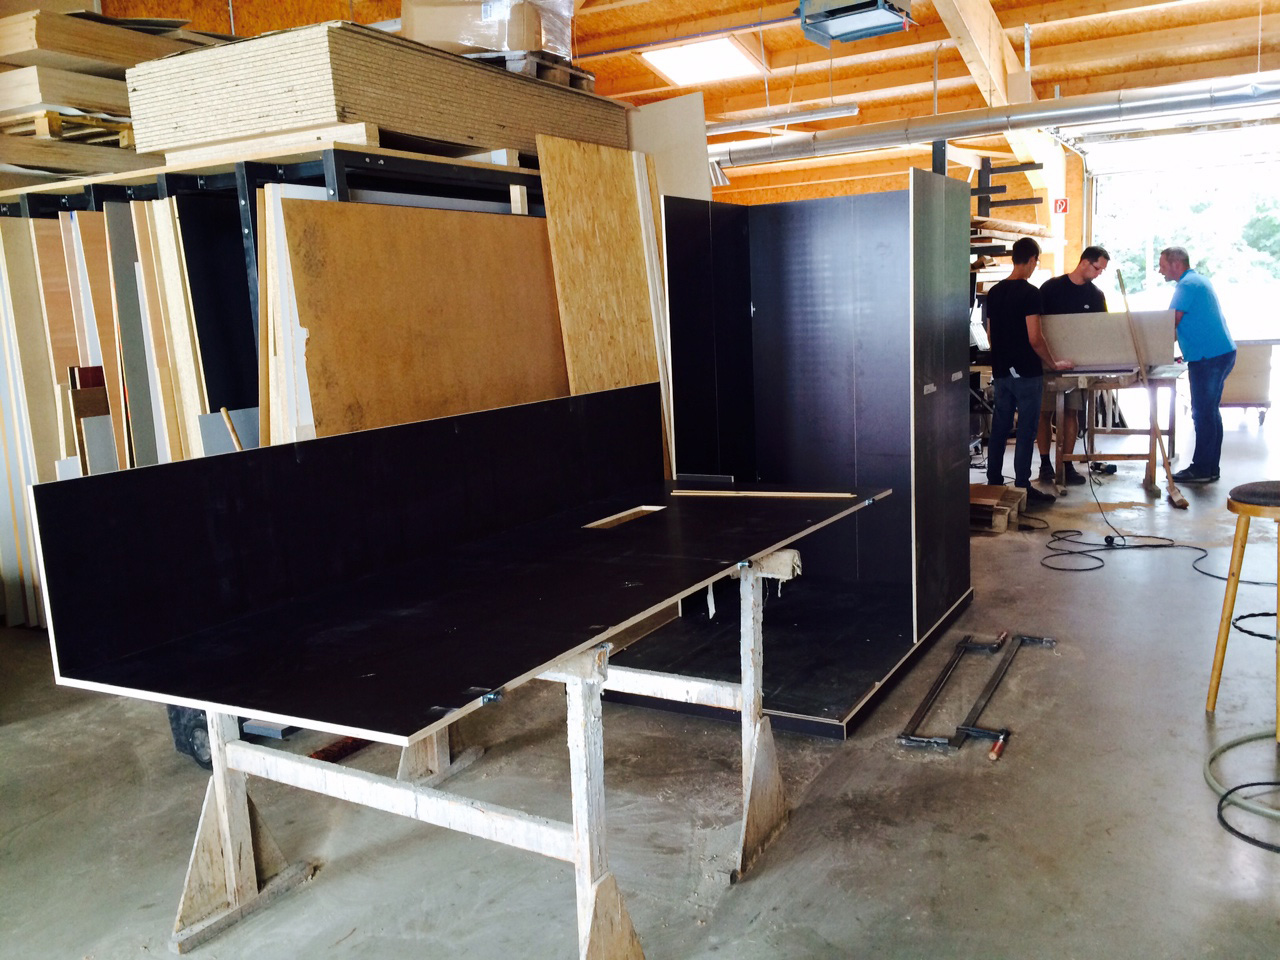 fotobox selbst bauen die fotobox. Black Bedroom Furniture Sets. Home Design Ideas